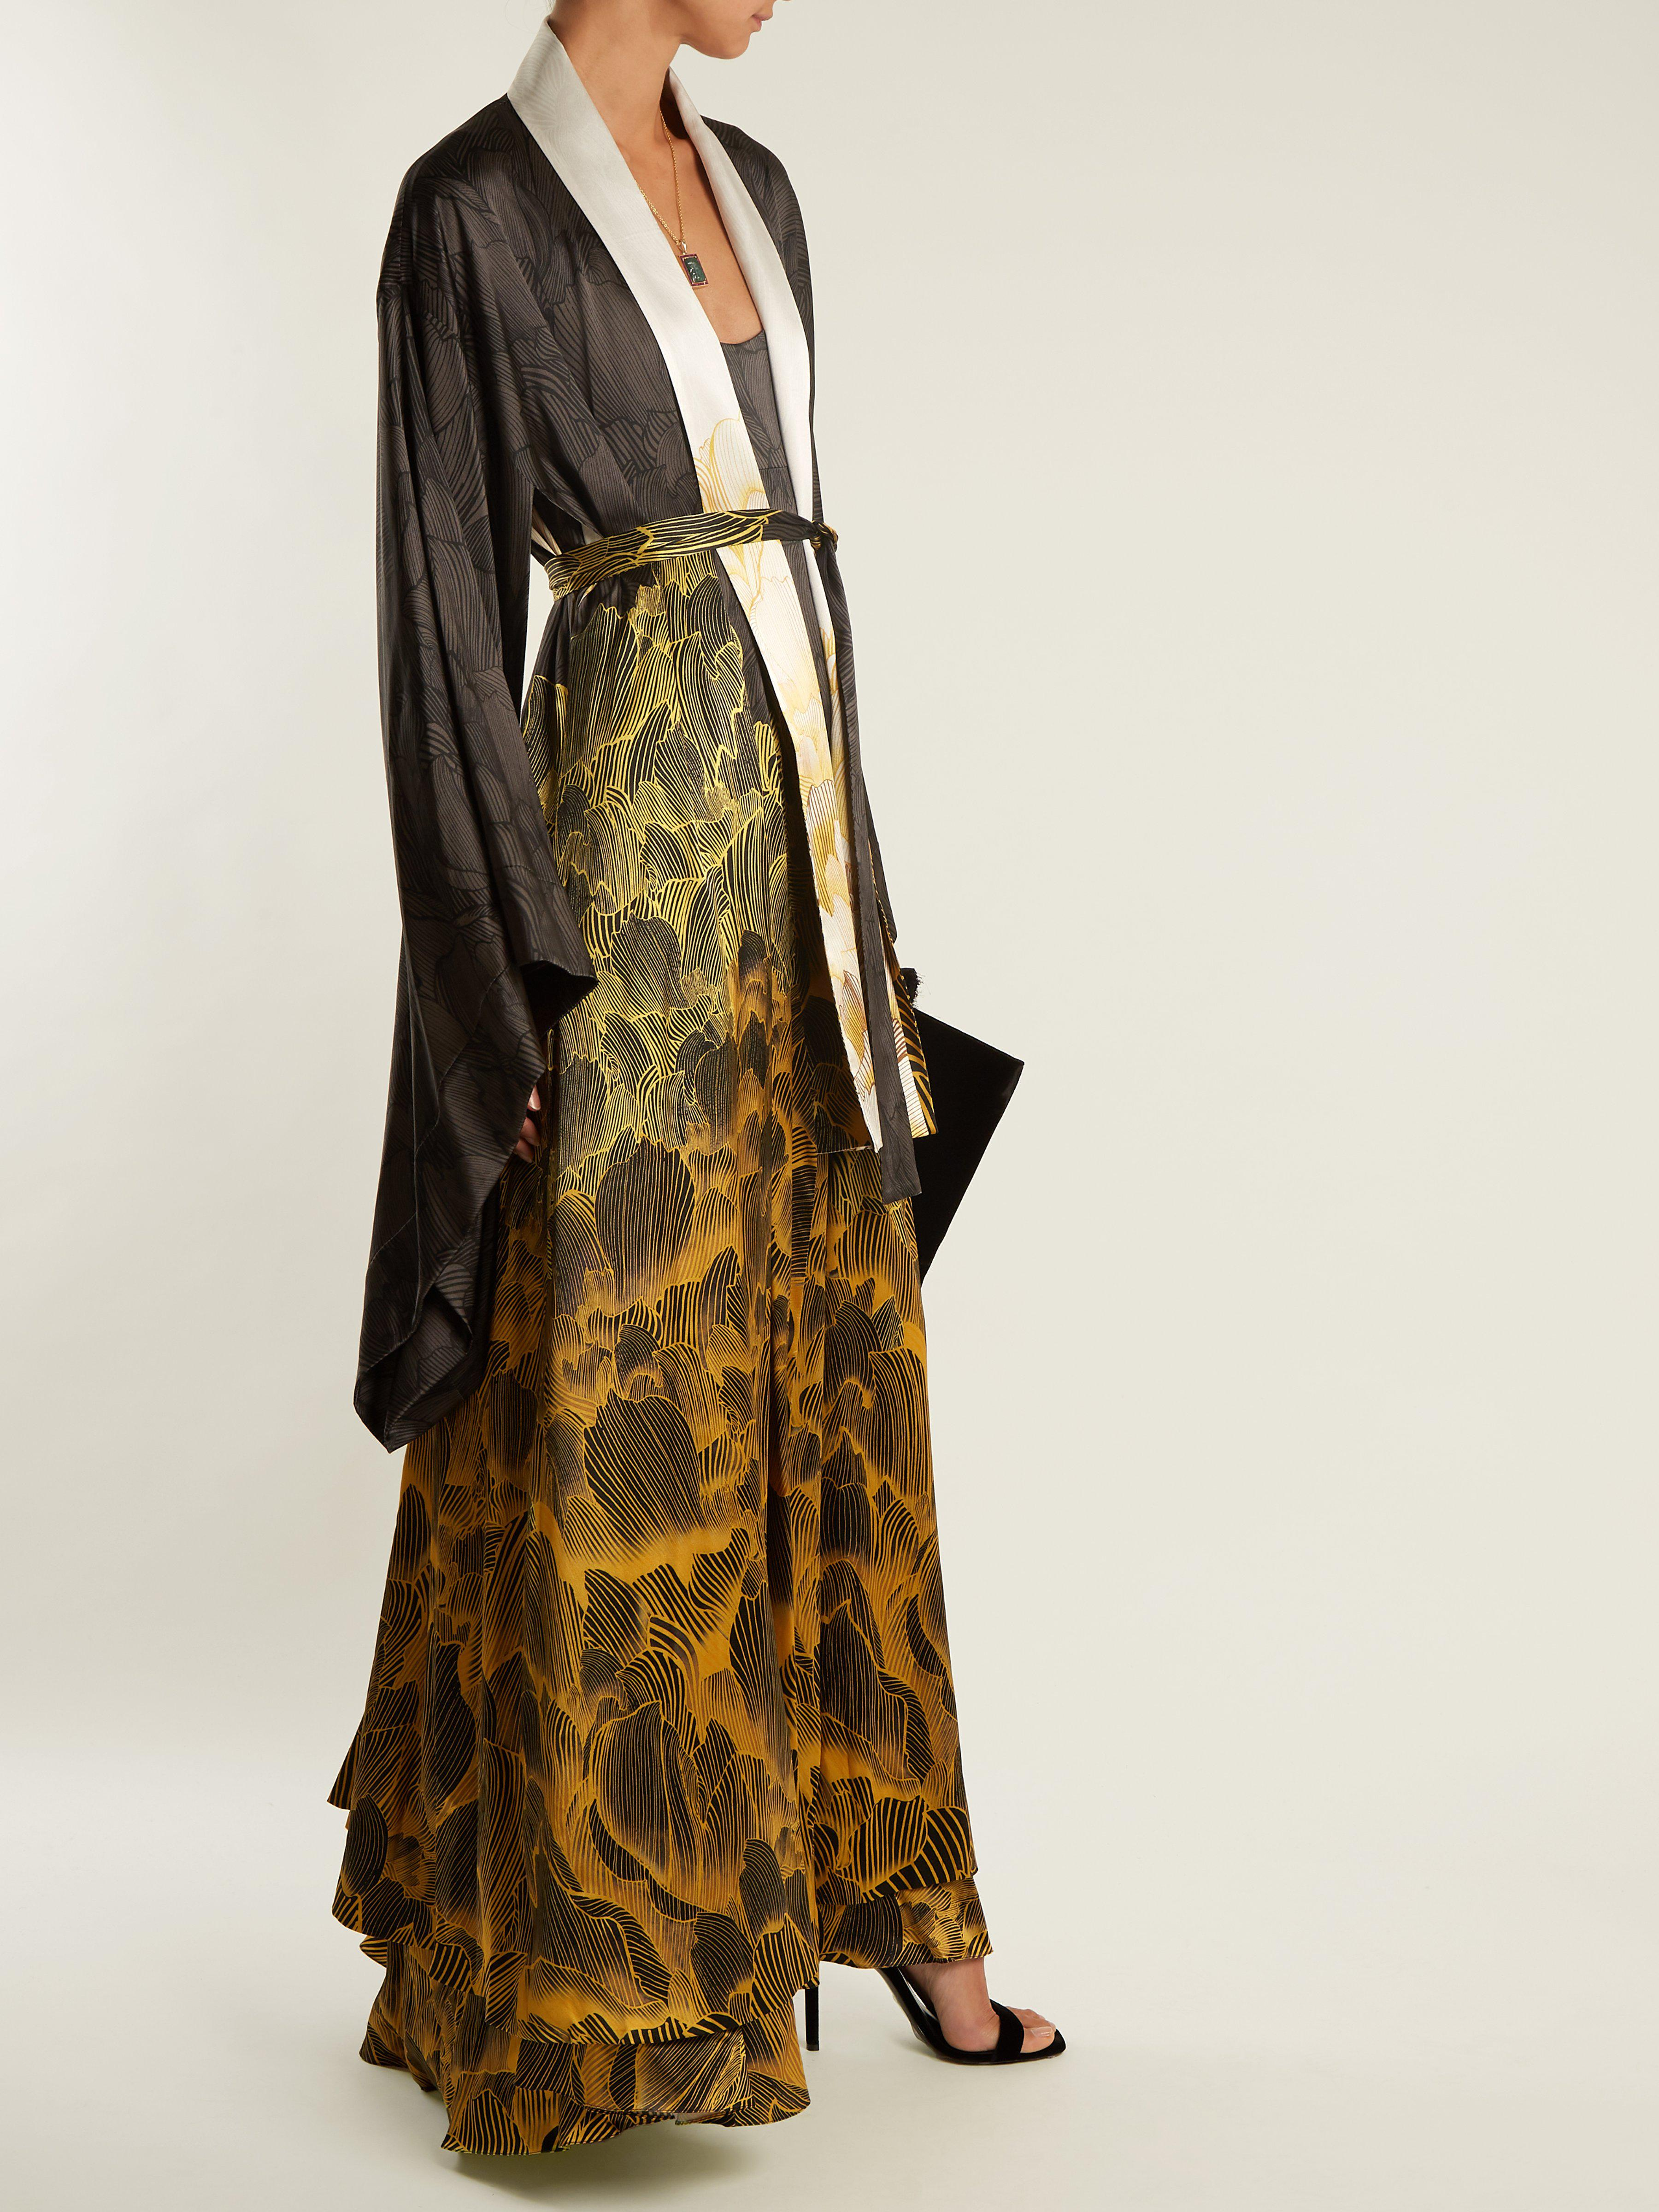 becb2dfaee9 adriana-iglesias-black-gold-Anna-Reversible-Floral-Print-Stretch-Silk-Robe.jpeg